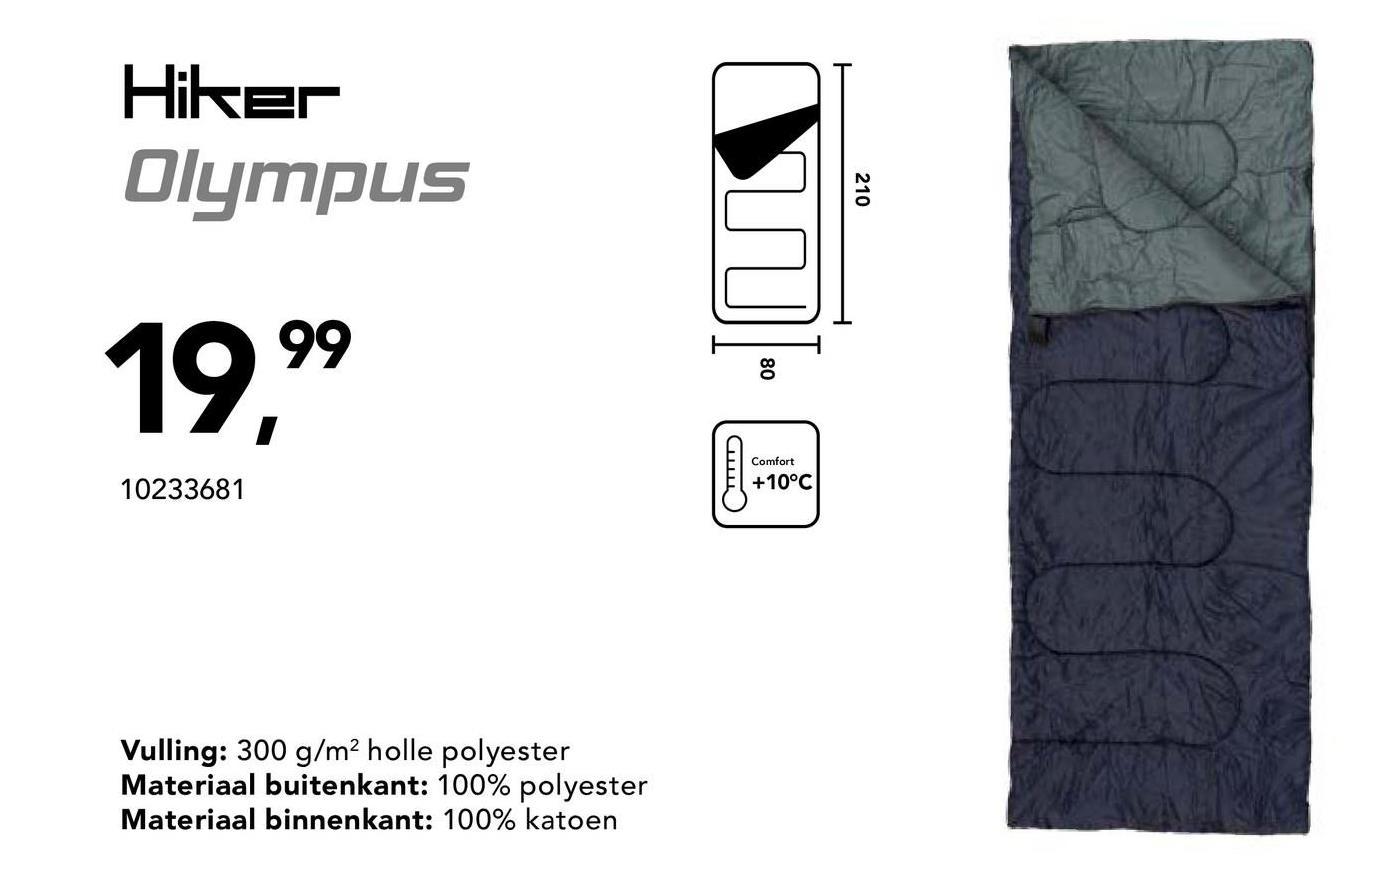 Slaapzak Olympus Hiker - Grijs - Goedkope Slaapzakken - Comfortabele slaapzak voor 1 persoon. Vulling: 300gr/m² holle polyester. Buitenkant: 100% polyester. Binnenkant: 100% katoen. Comforttemperatuur +10°. Afmetingen: 210cm x 80cm.